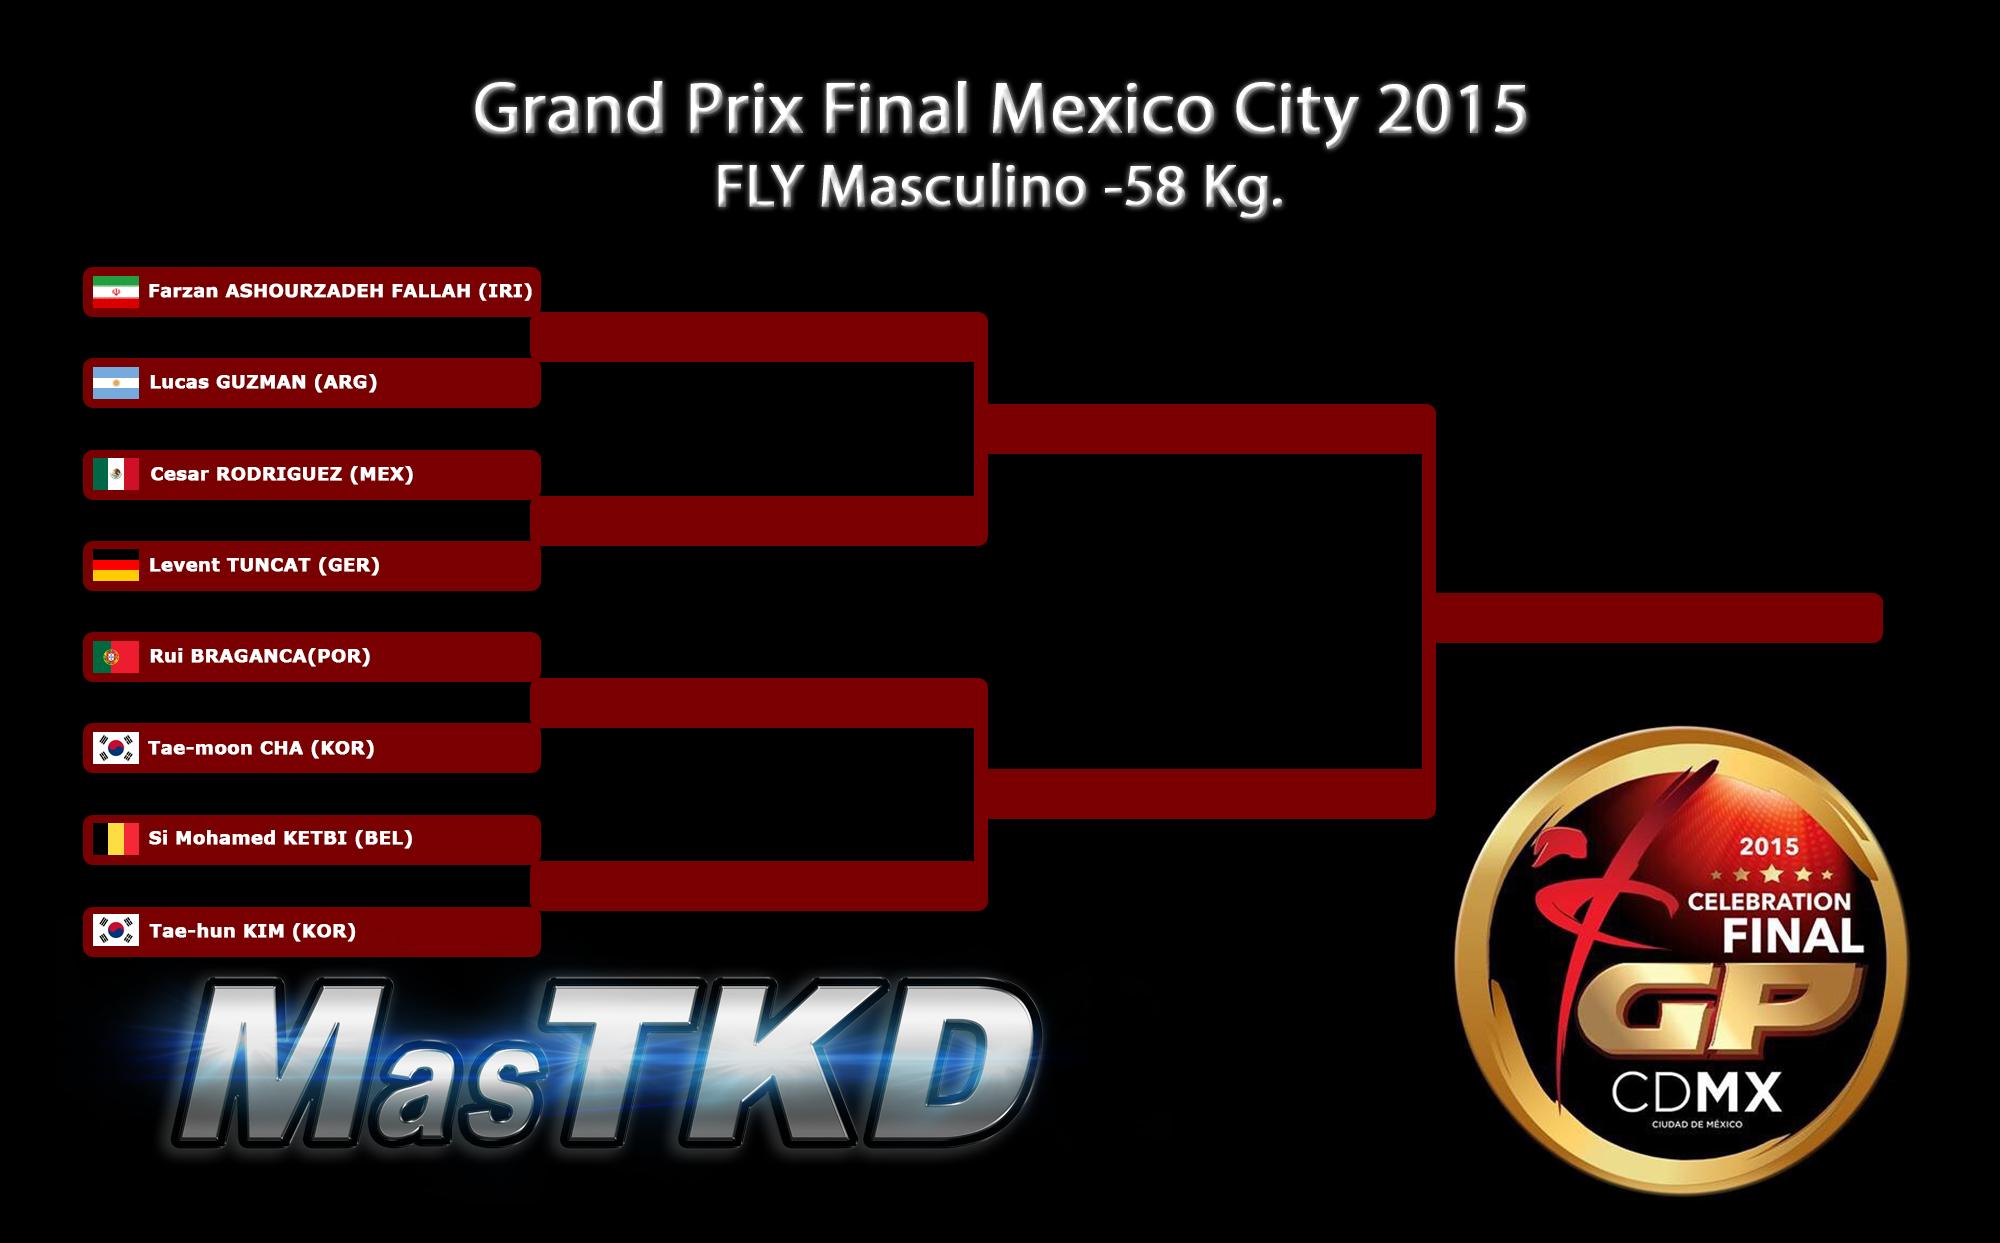 M-58_Grafica_GPFinal_MexicoCity2015